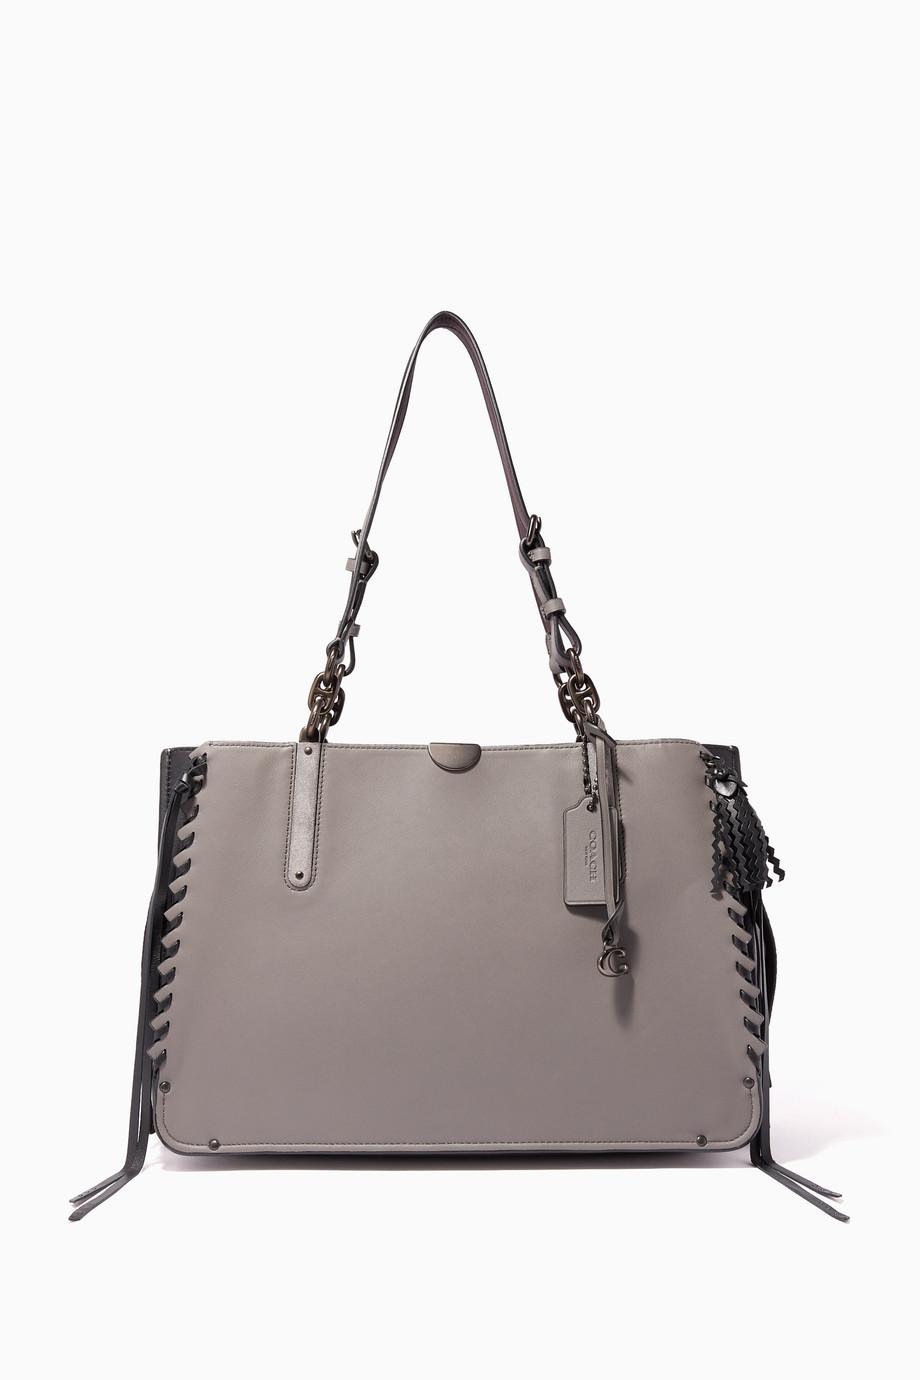 4781b17d20de6c Shop Coach Grey Heather-Grey Whipstitch Dreamer 36 Tote Bag for ...